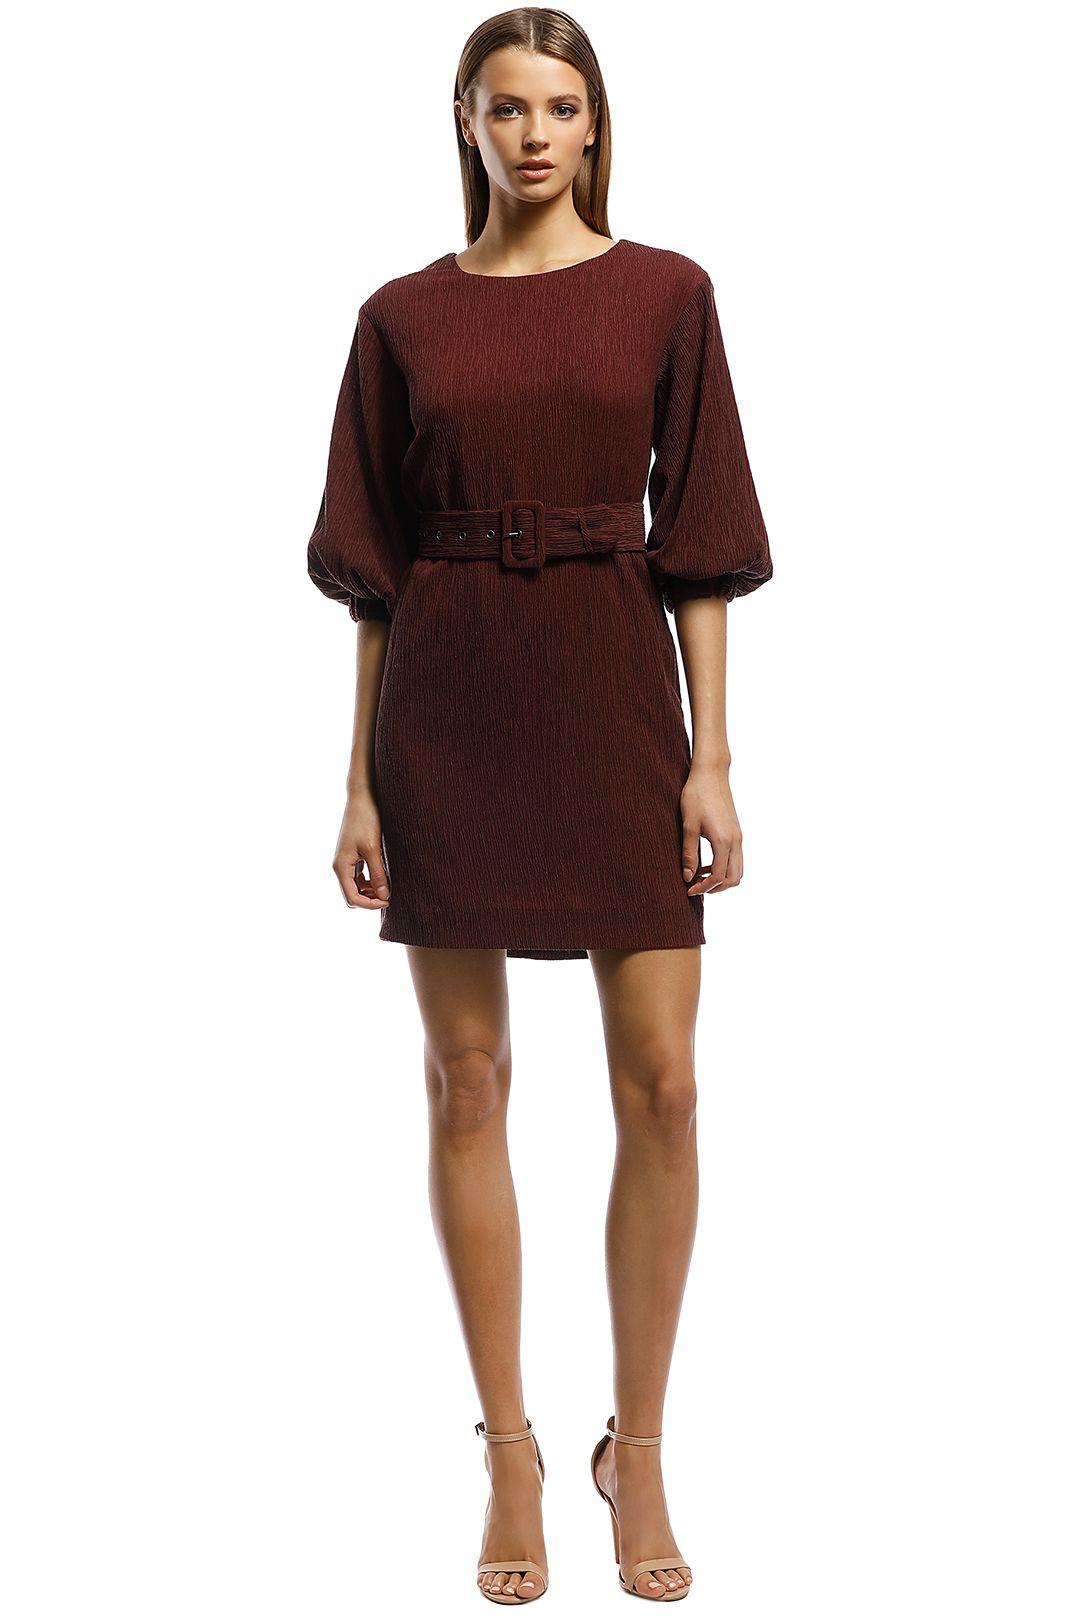 Rodeo Show-Sabrina Mini Dress-Plum-Front